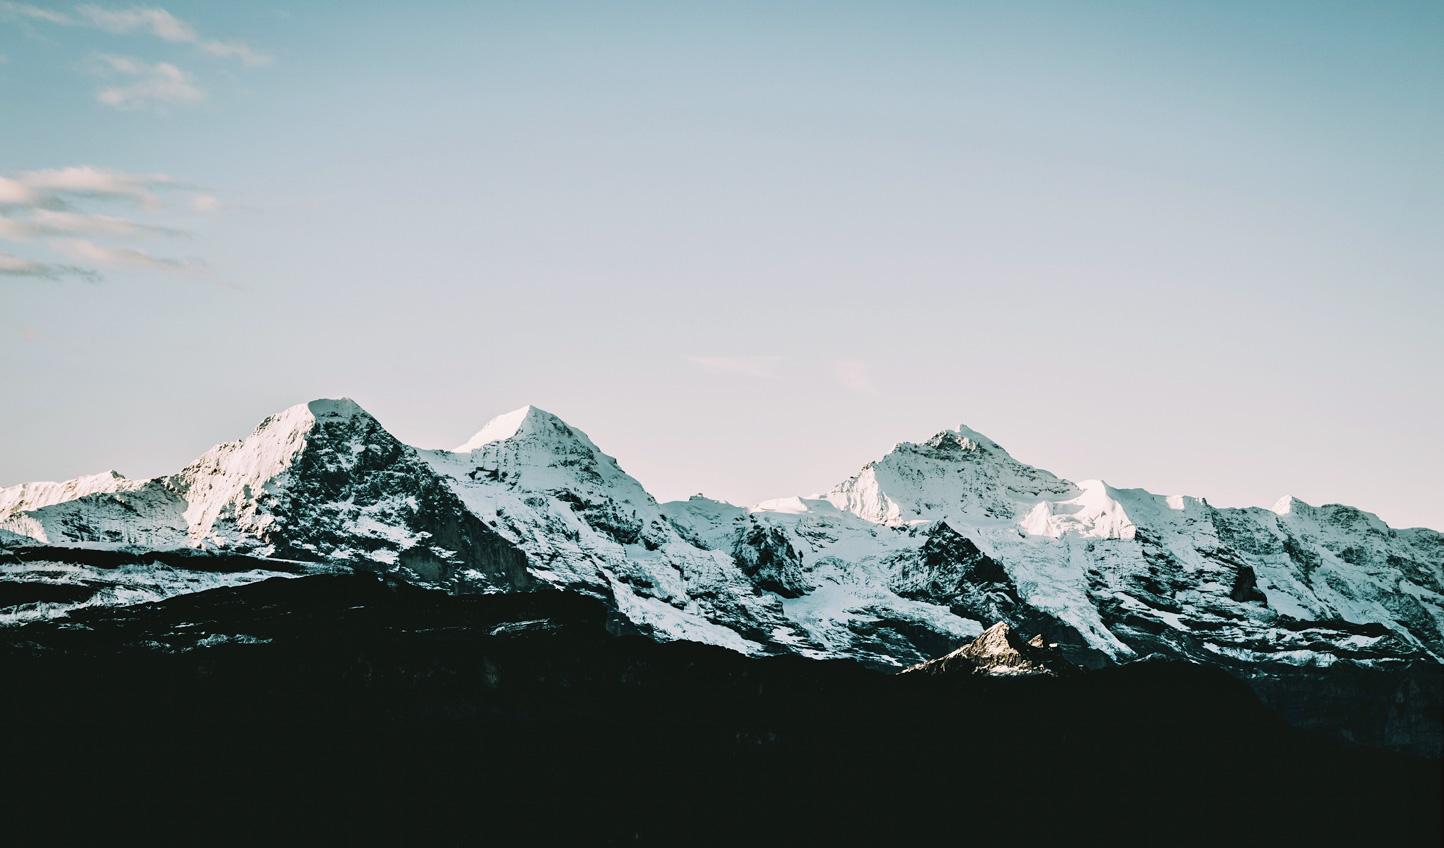 Venture deep into the mountains